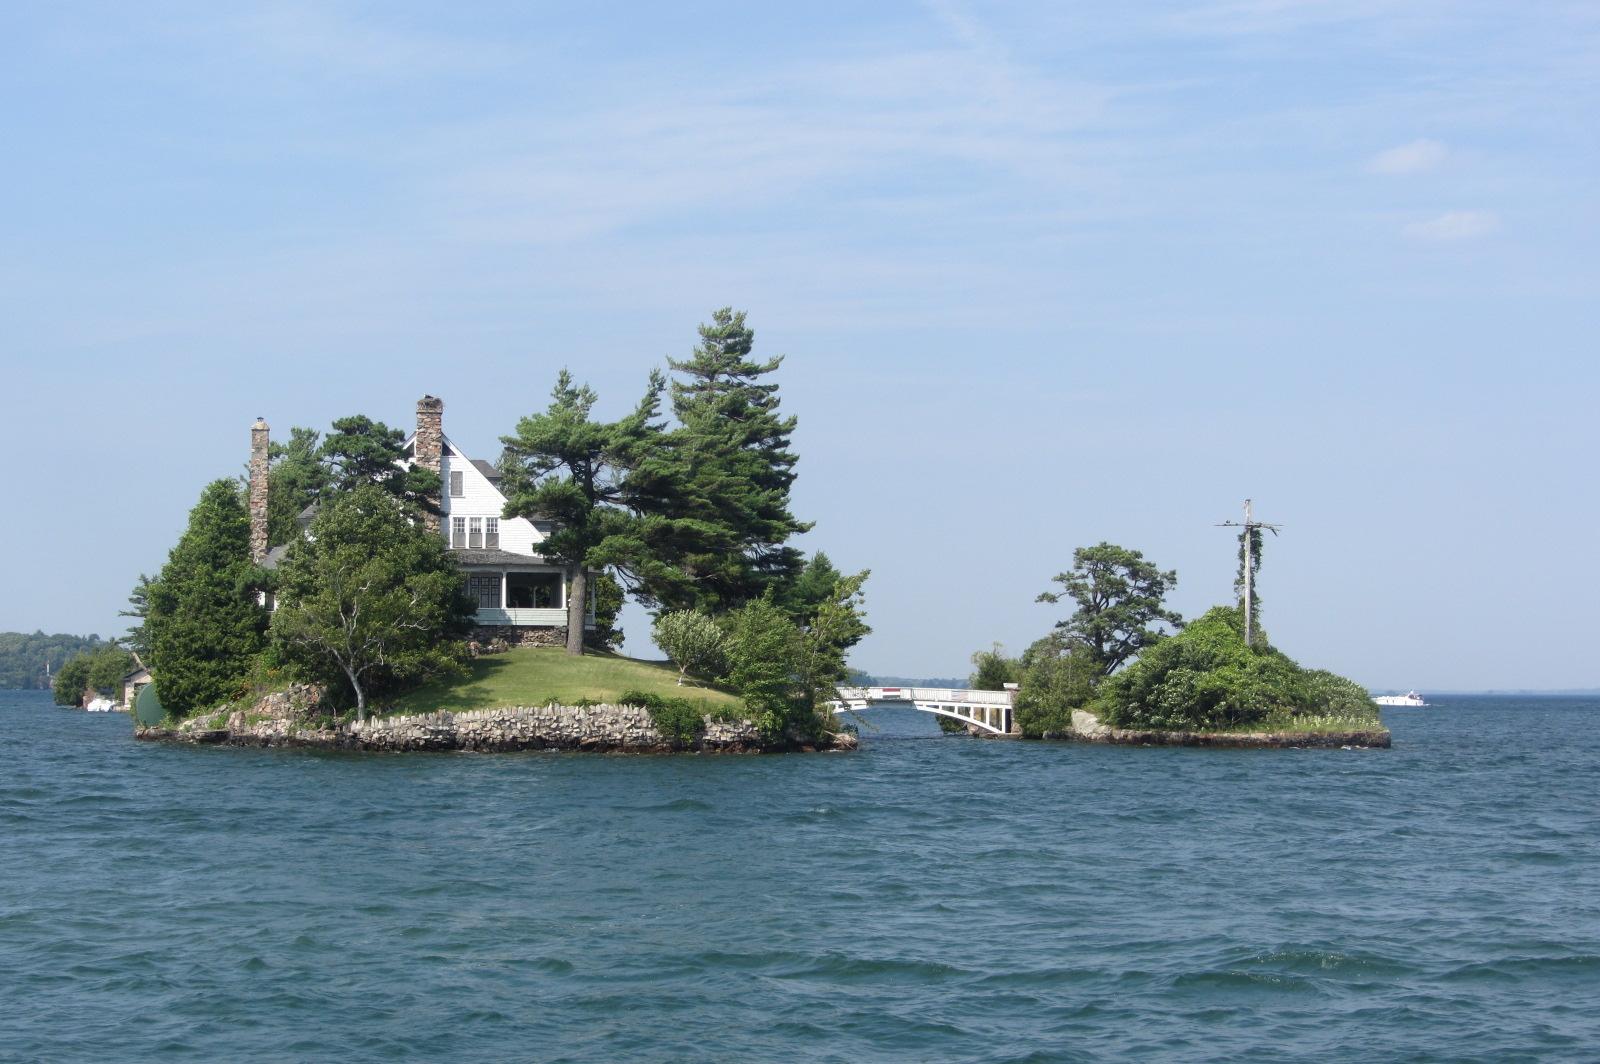 Tiny Islands One House